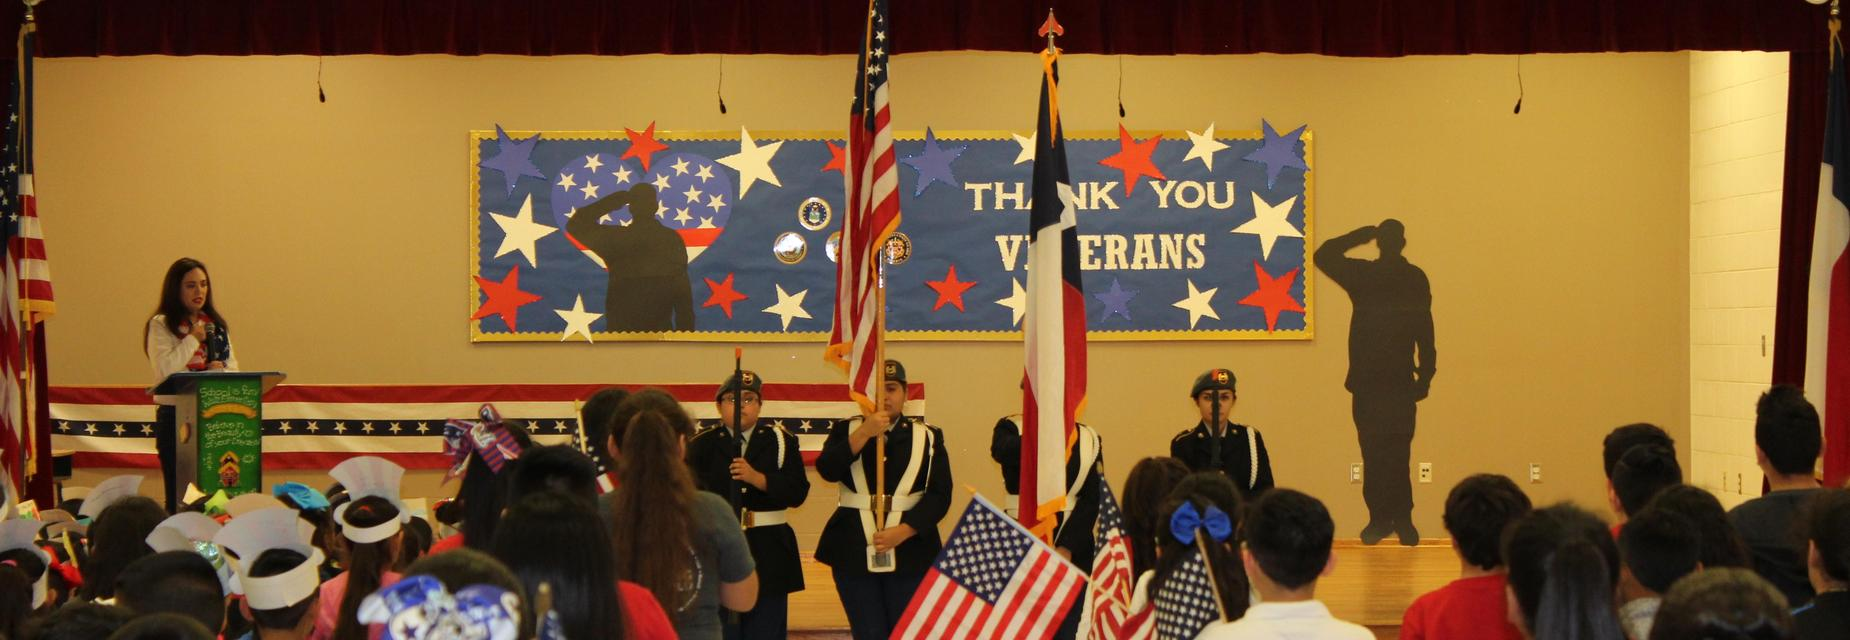 MHS Color Guard at Veteran's Day program